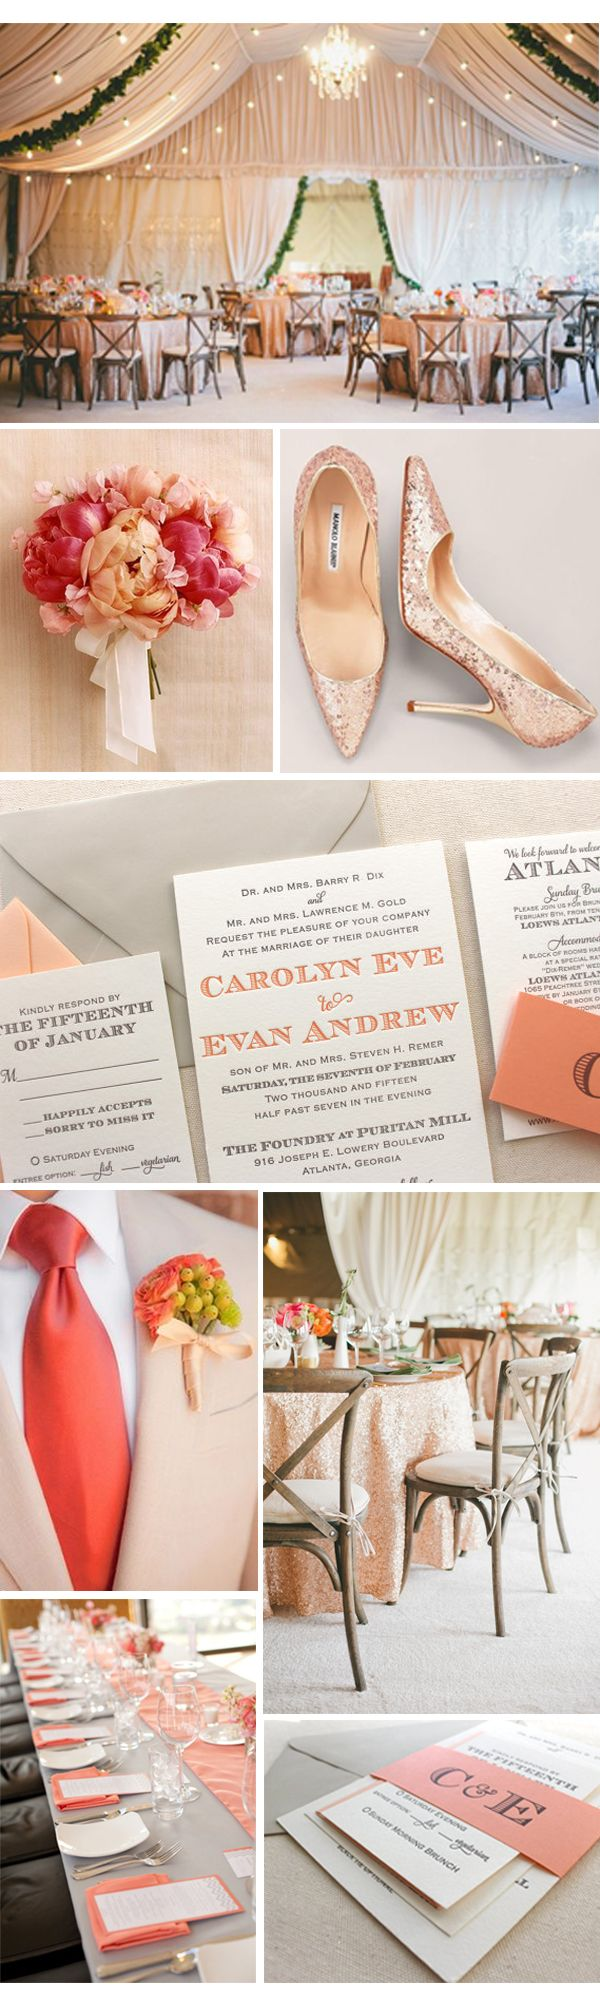 Laurel suite whimsical modern letterpress wedding invitation - coral, grey, bold, modern, pink, fuchsia, blush, peach, orange, glitter, gold, tan, glamour, chandelier, rustic, color trends, chic, beach, stunning.